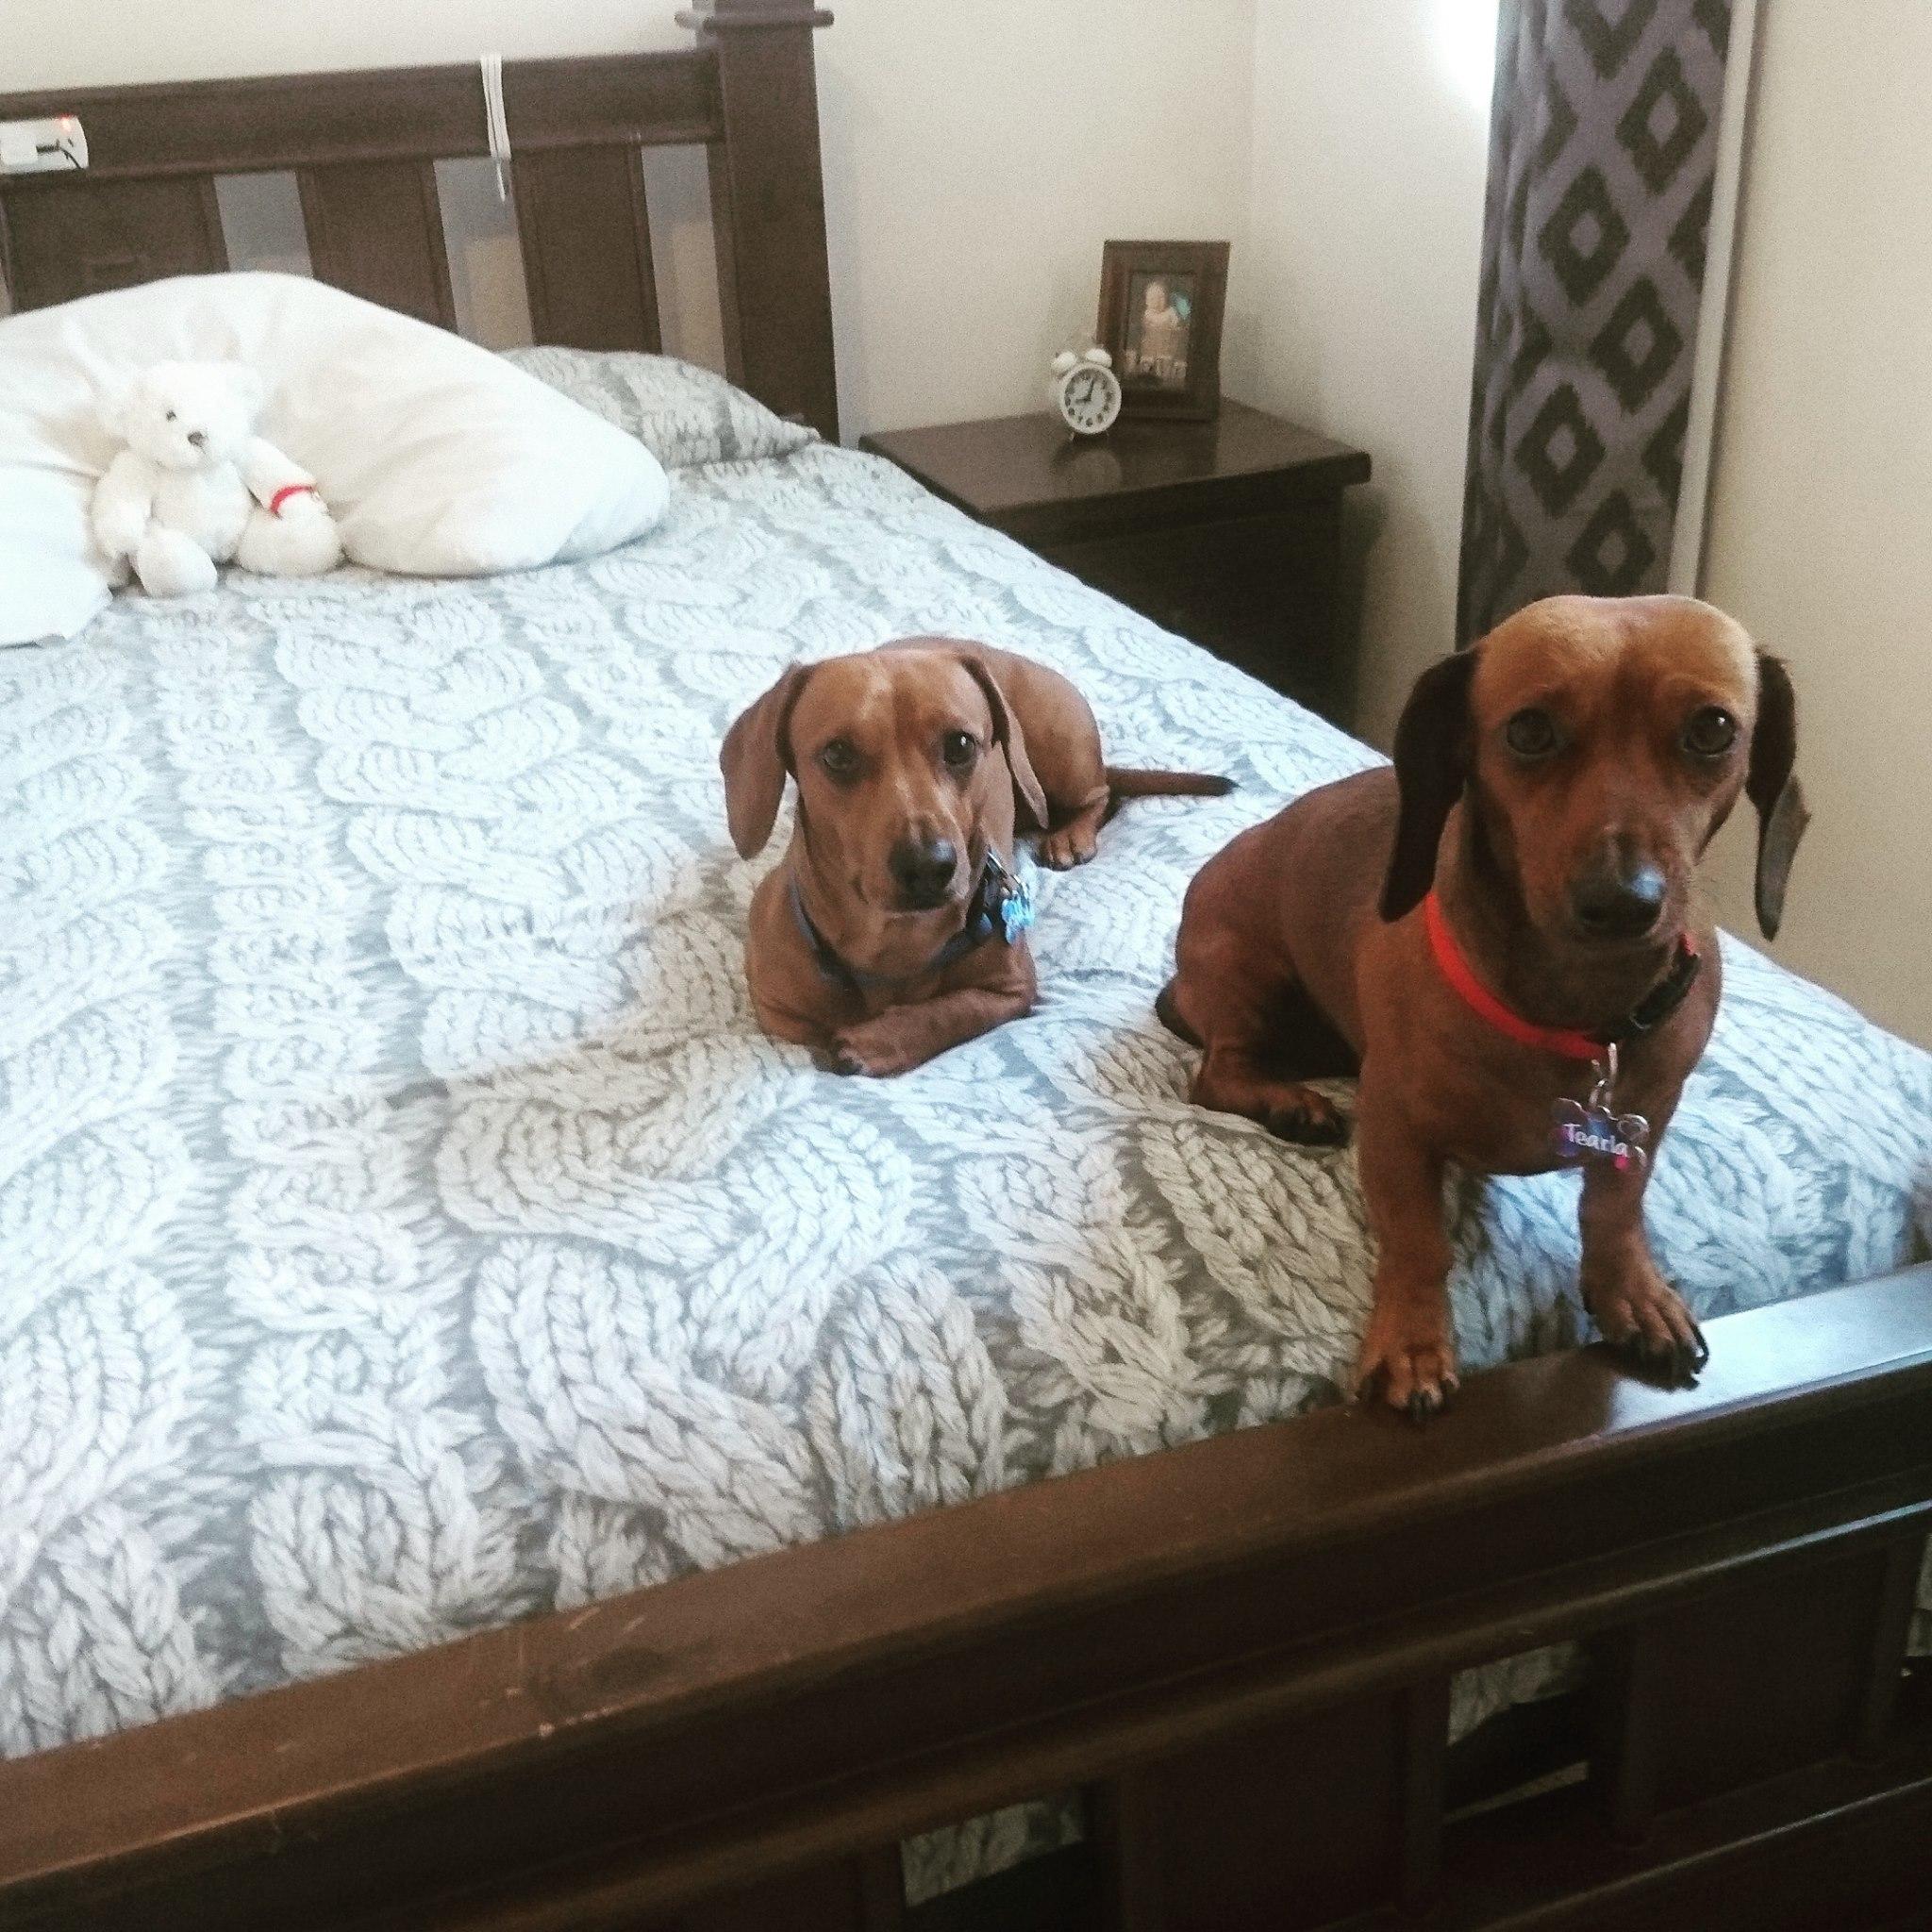 dachshund lovers, PetCloud